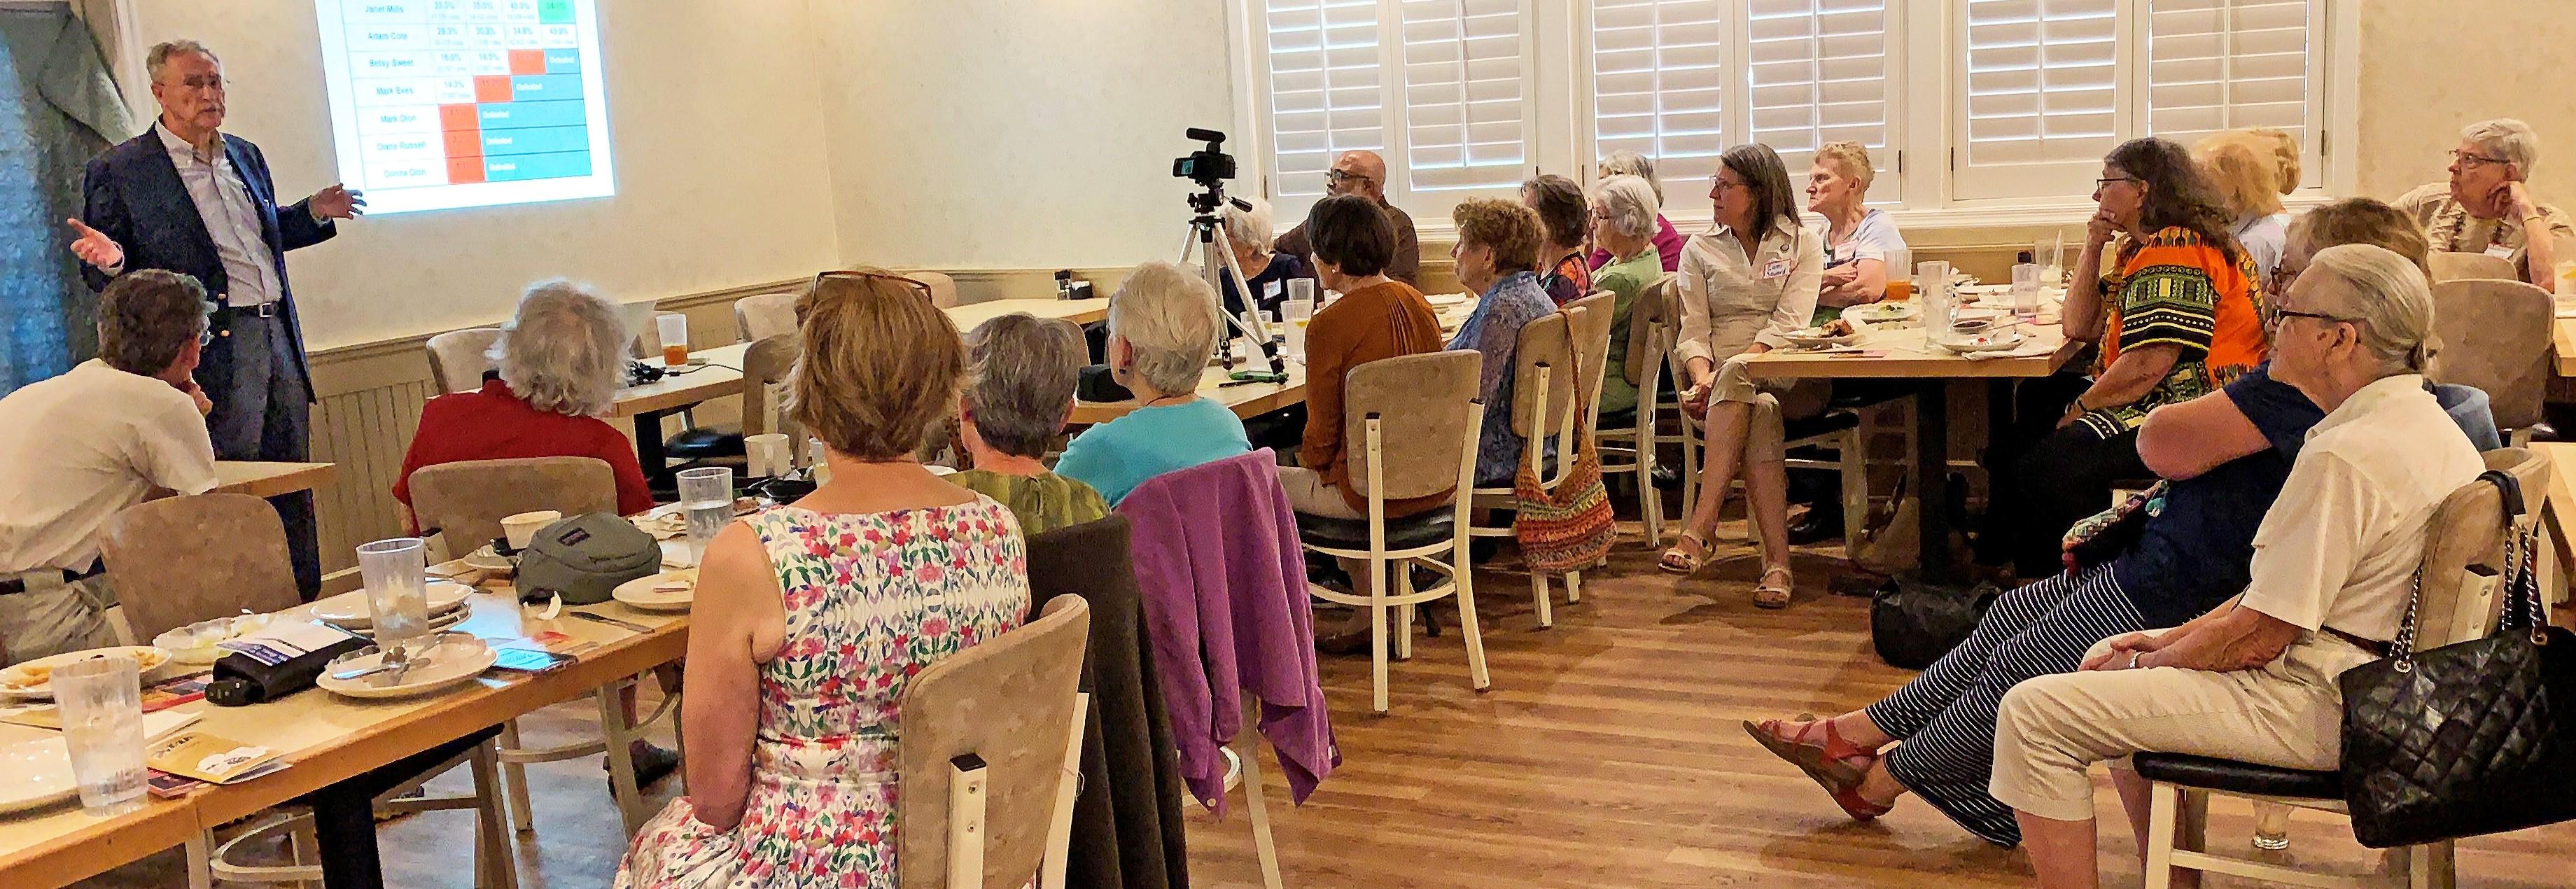 LWVNCC members and guests listen to Dr. Jack Nagel speak